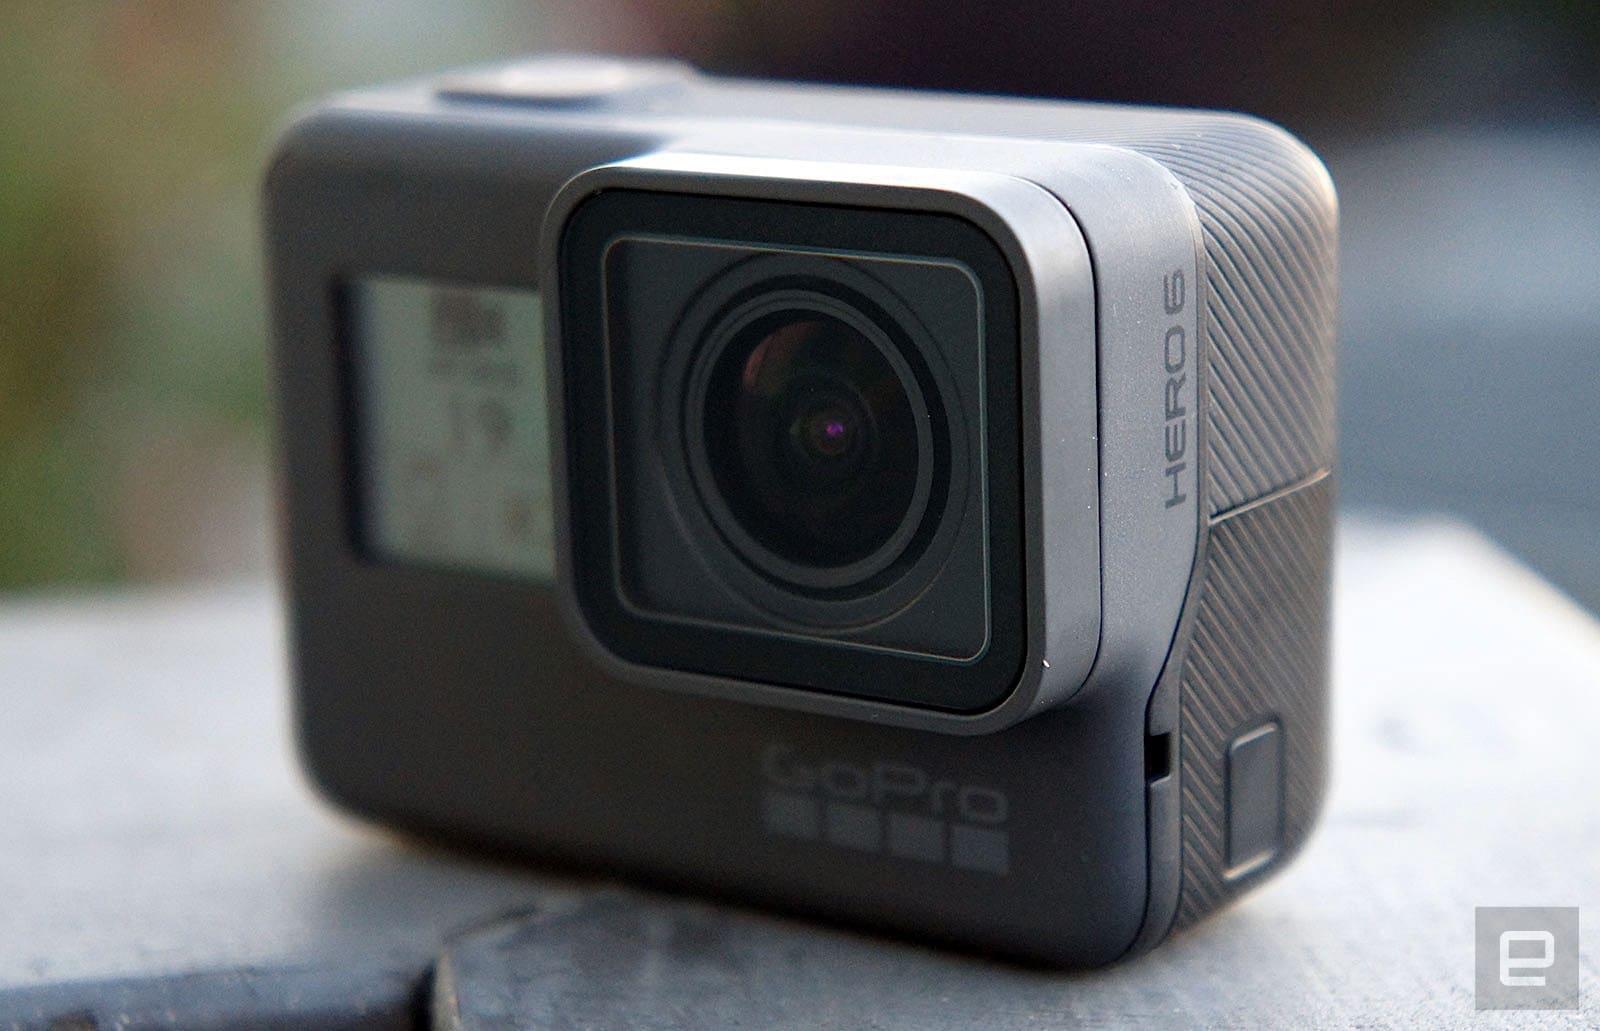 GoPro's latest trade-in program will take any digital camera